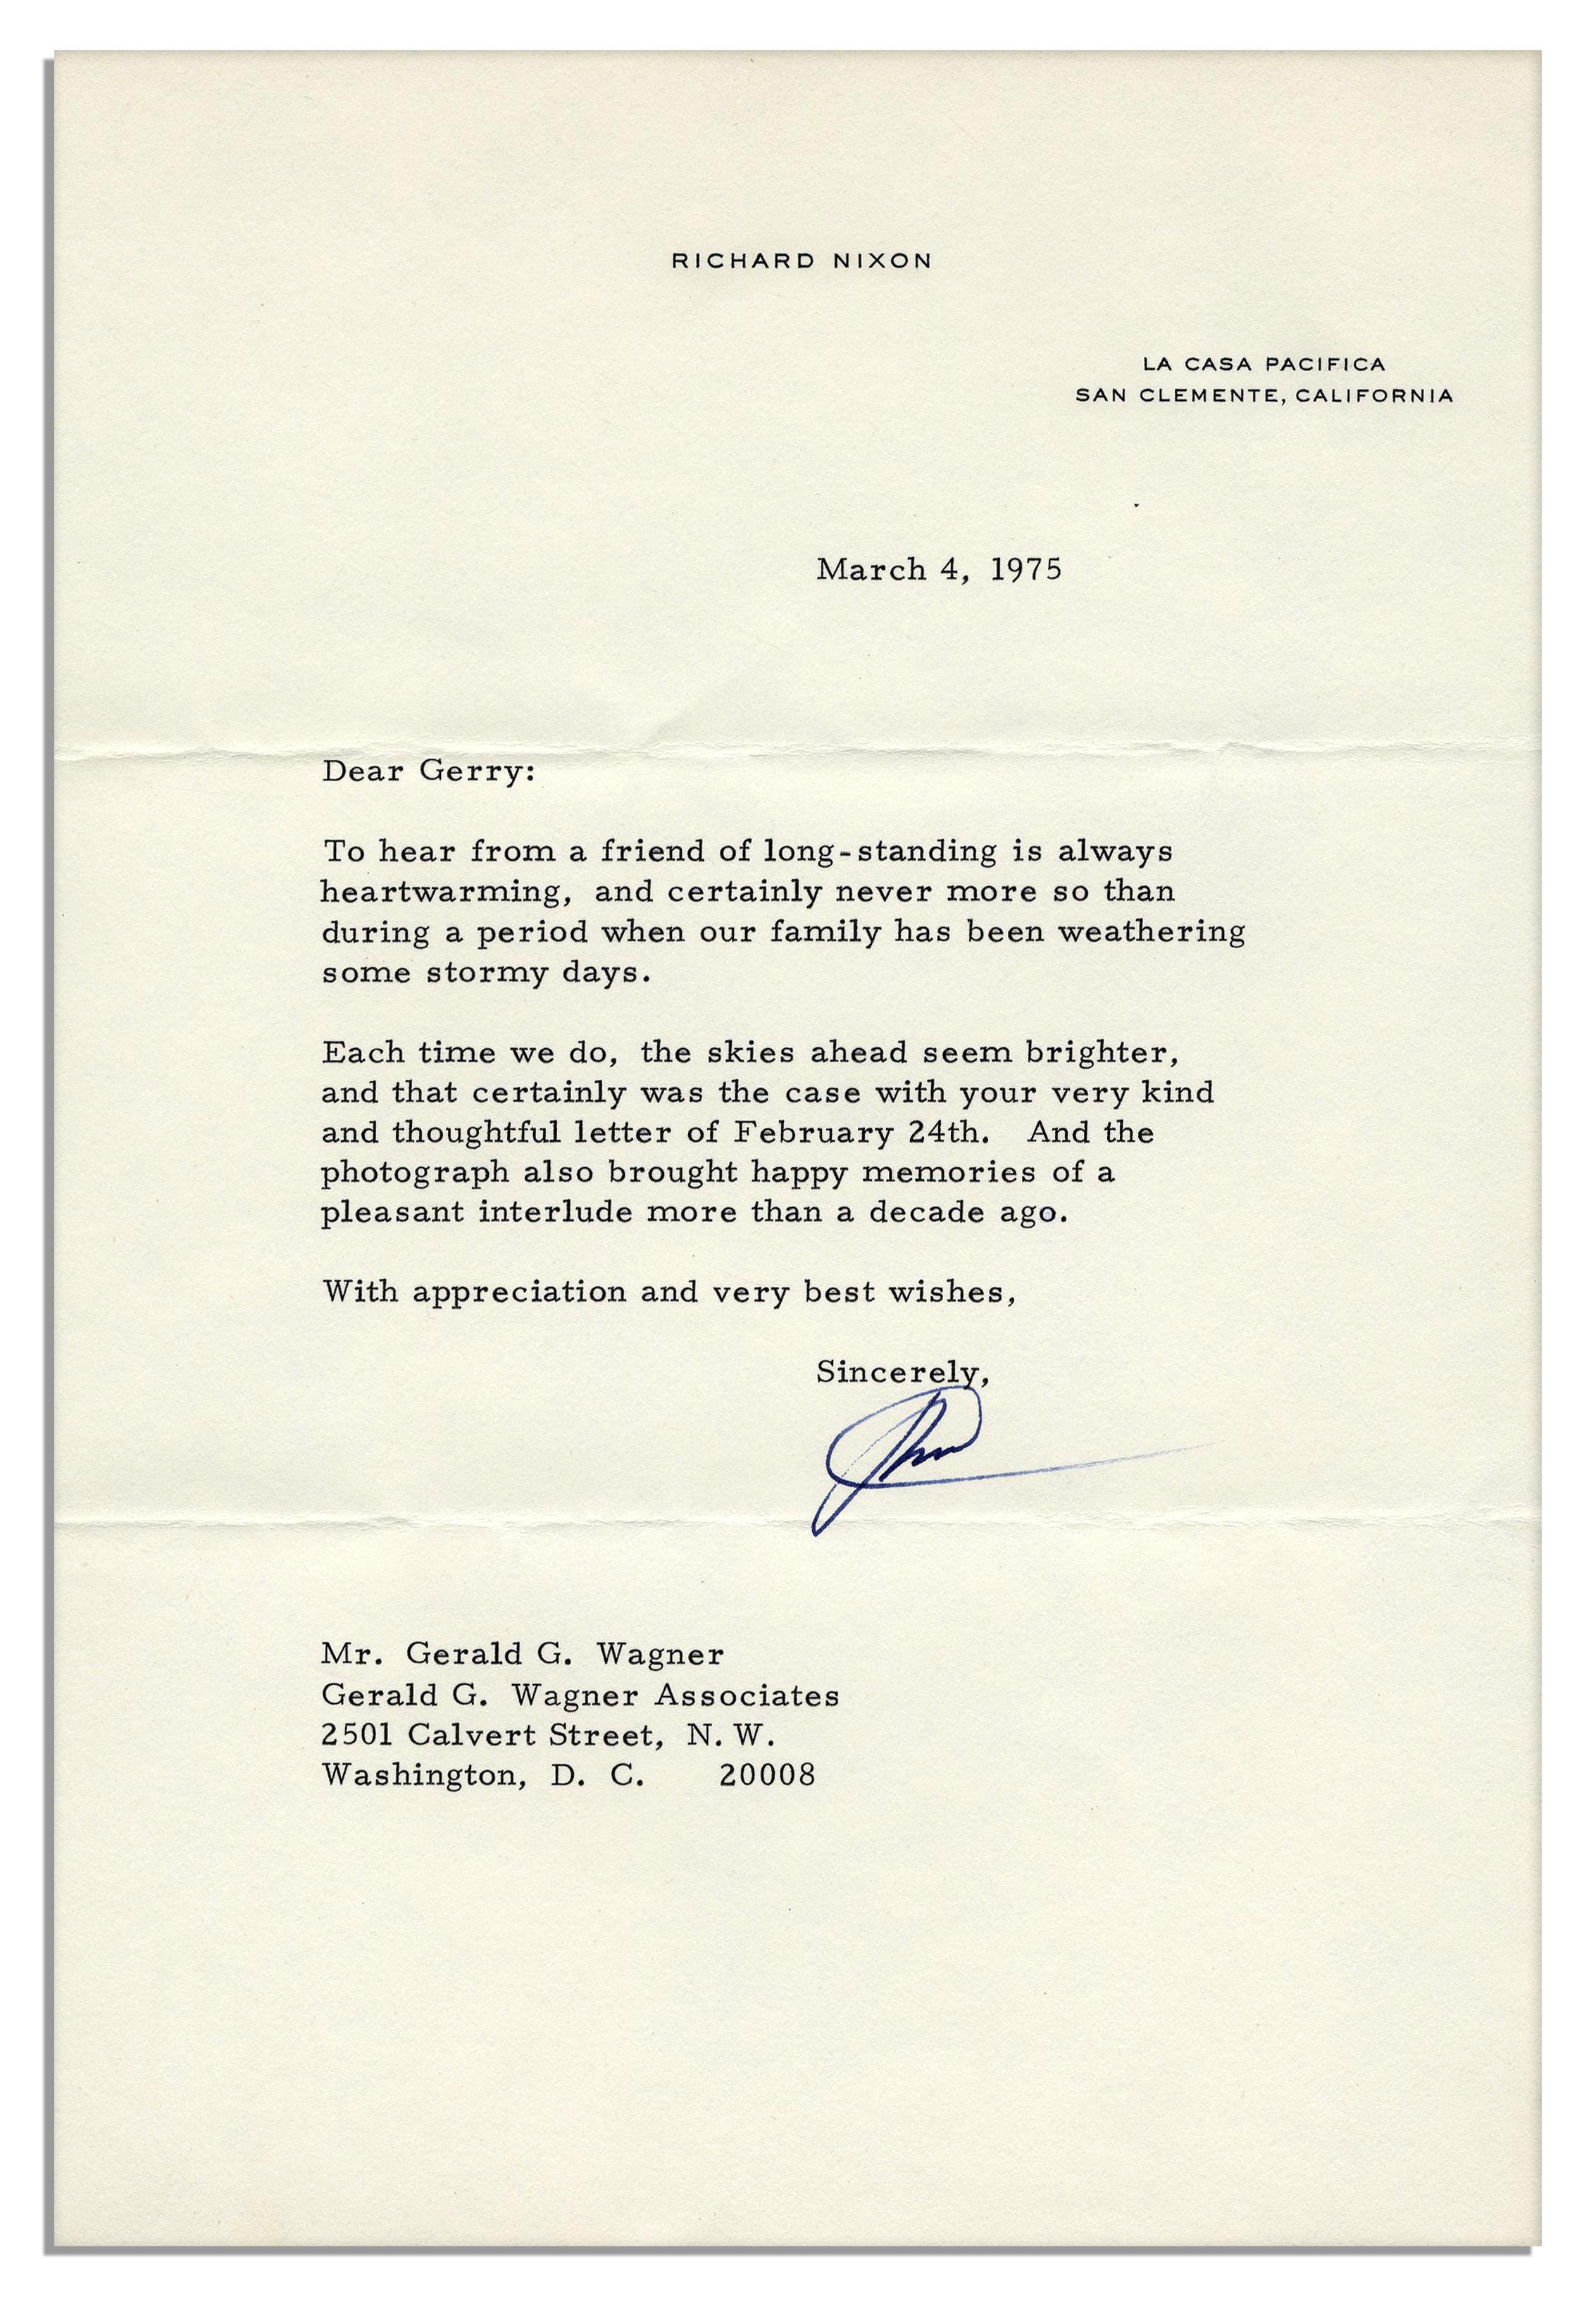 Richard Nixon Resignation Letter Gallery Letter Format Formal Sample